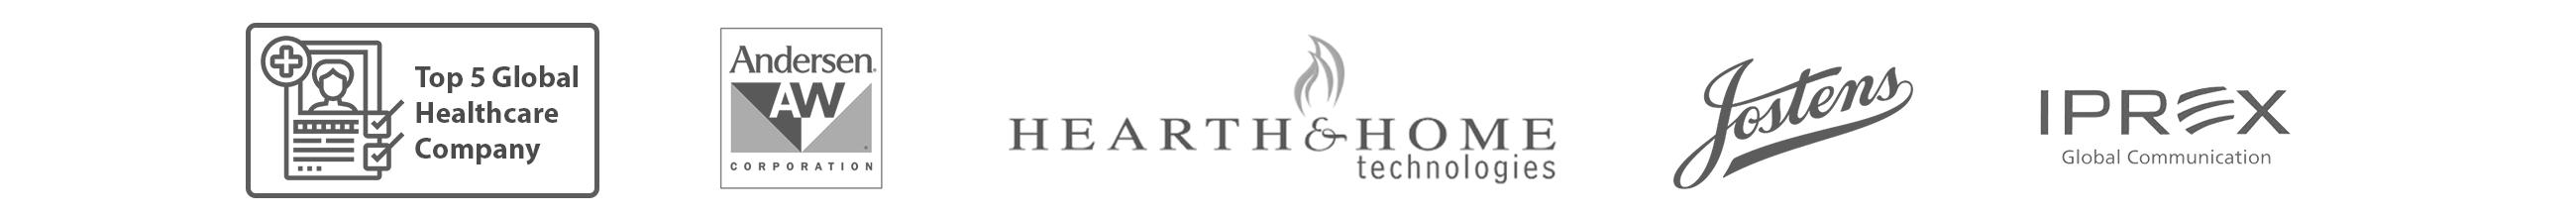 Customer_Logos_Single_Line_BW